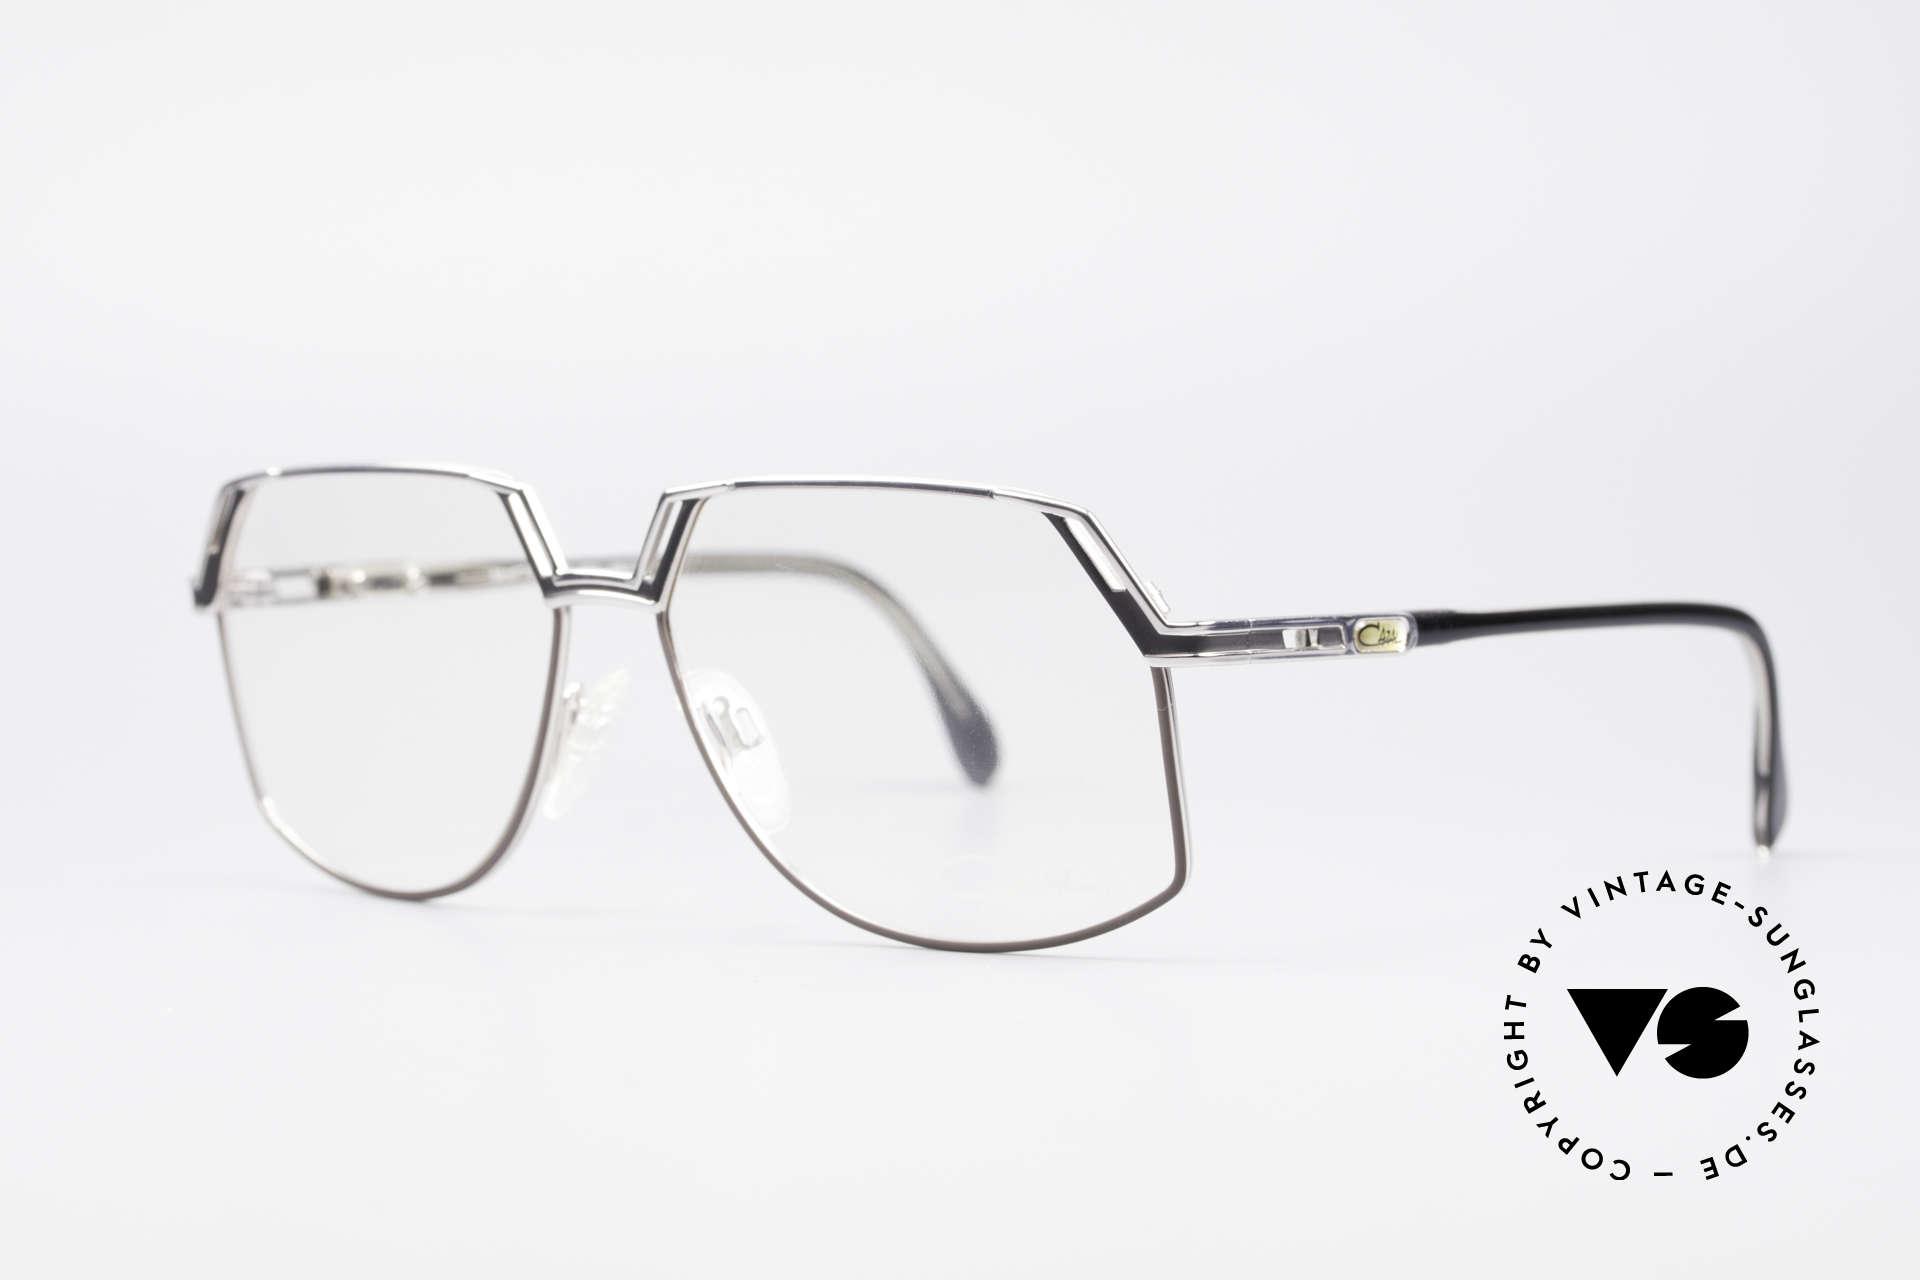 Cazal 738 True Vintage Eyeglasses, never worn, NOS (like all our old vintage Cazal glasses), Made for Men